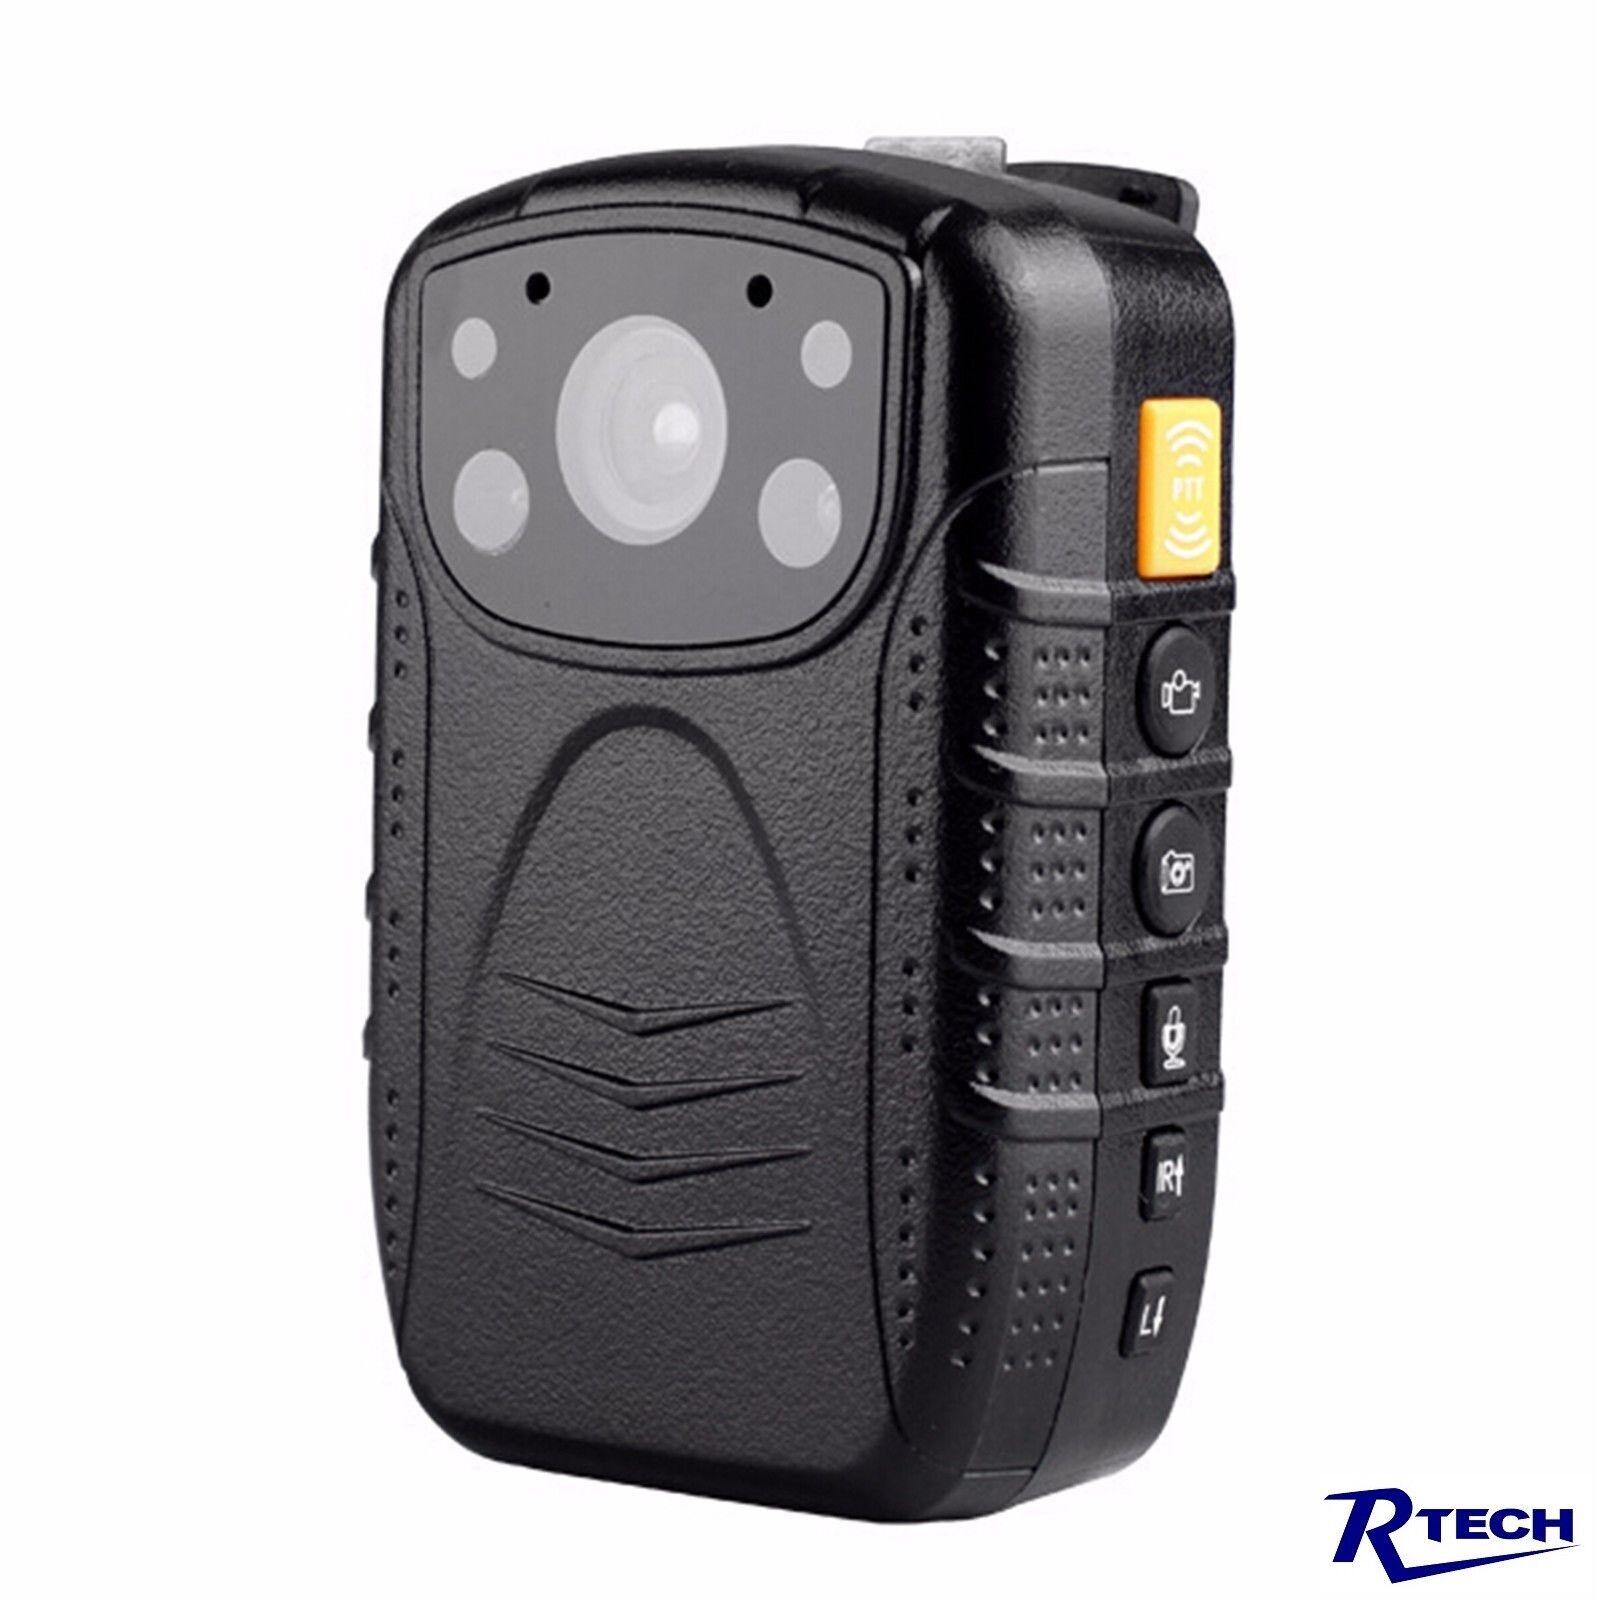 Купить R-Tech HD 1080p Infrared Night Vision Police Body Camera Security 32 GB